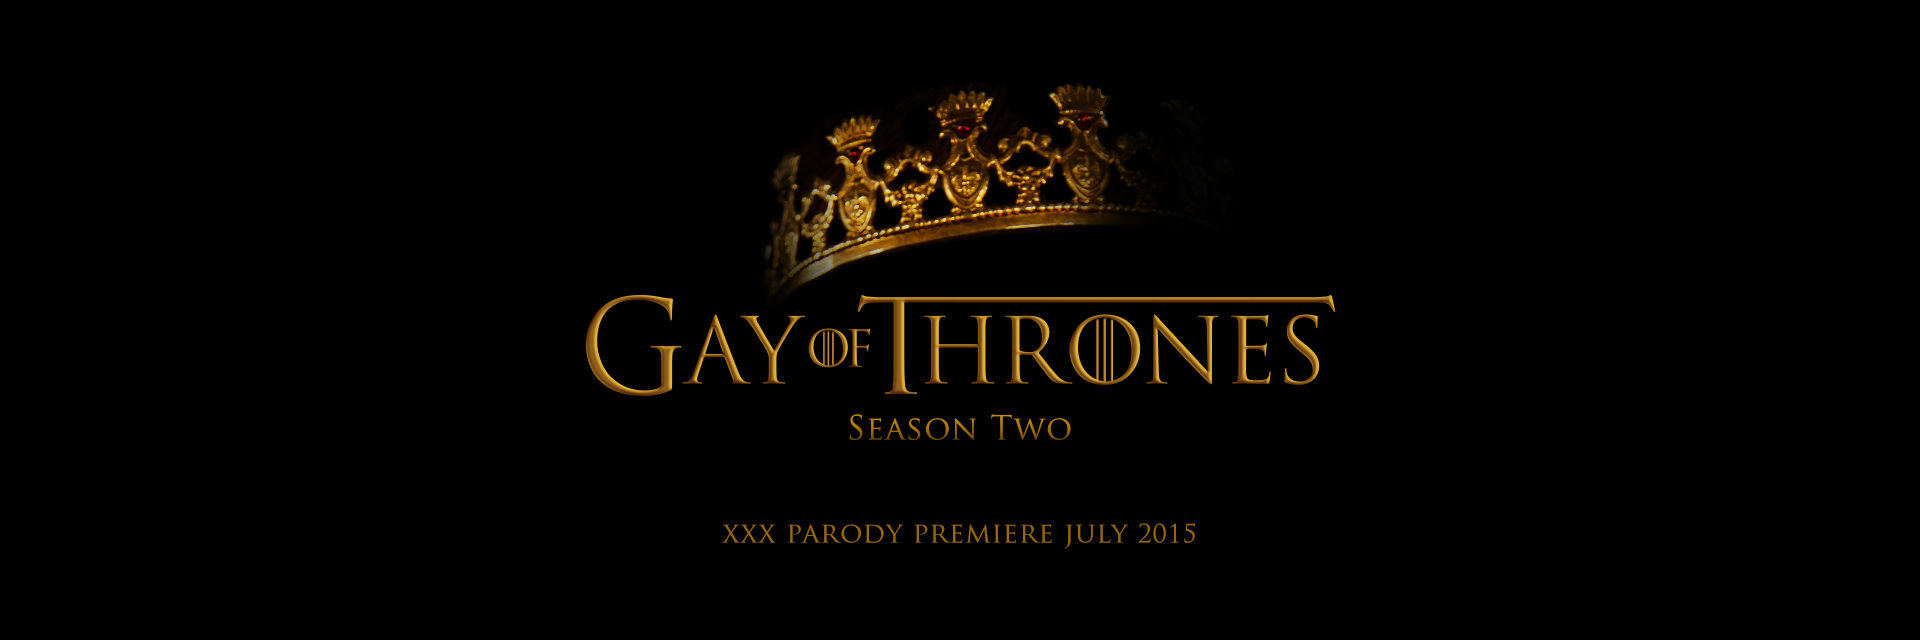 Gay Of Thrones Season Two